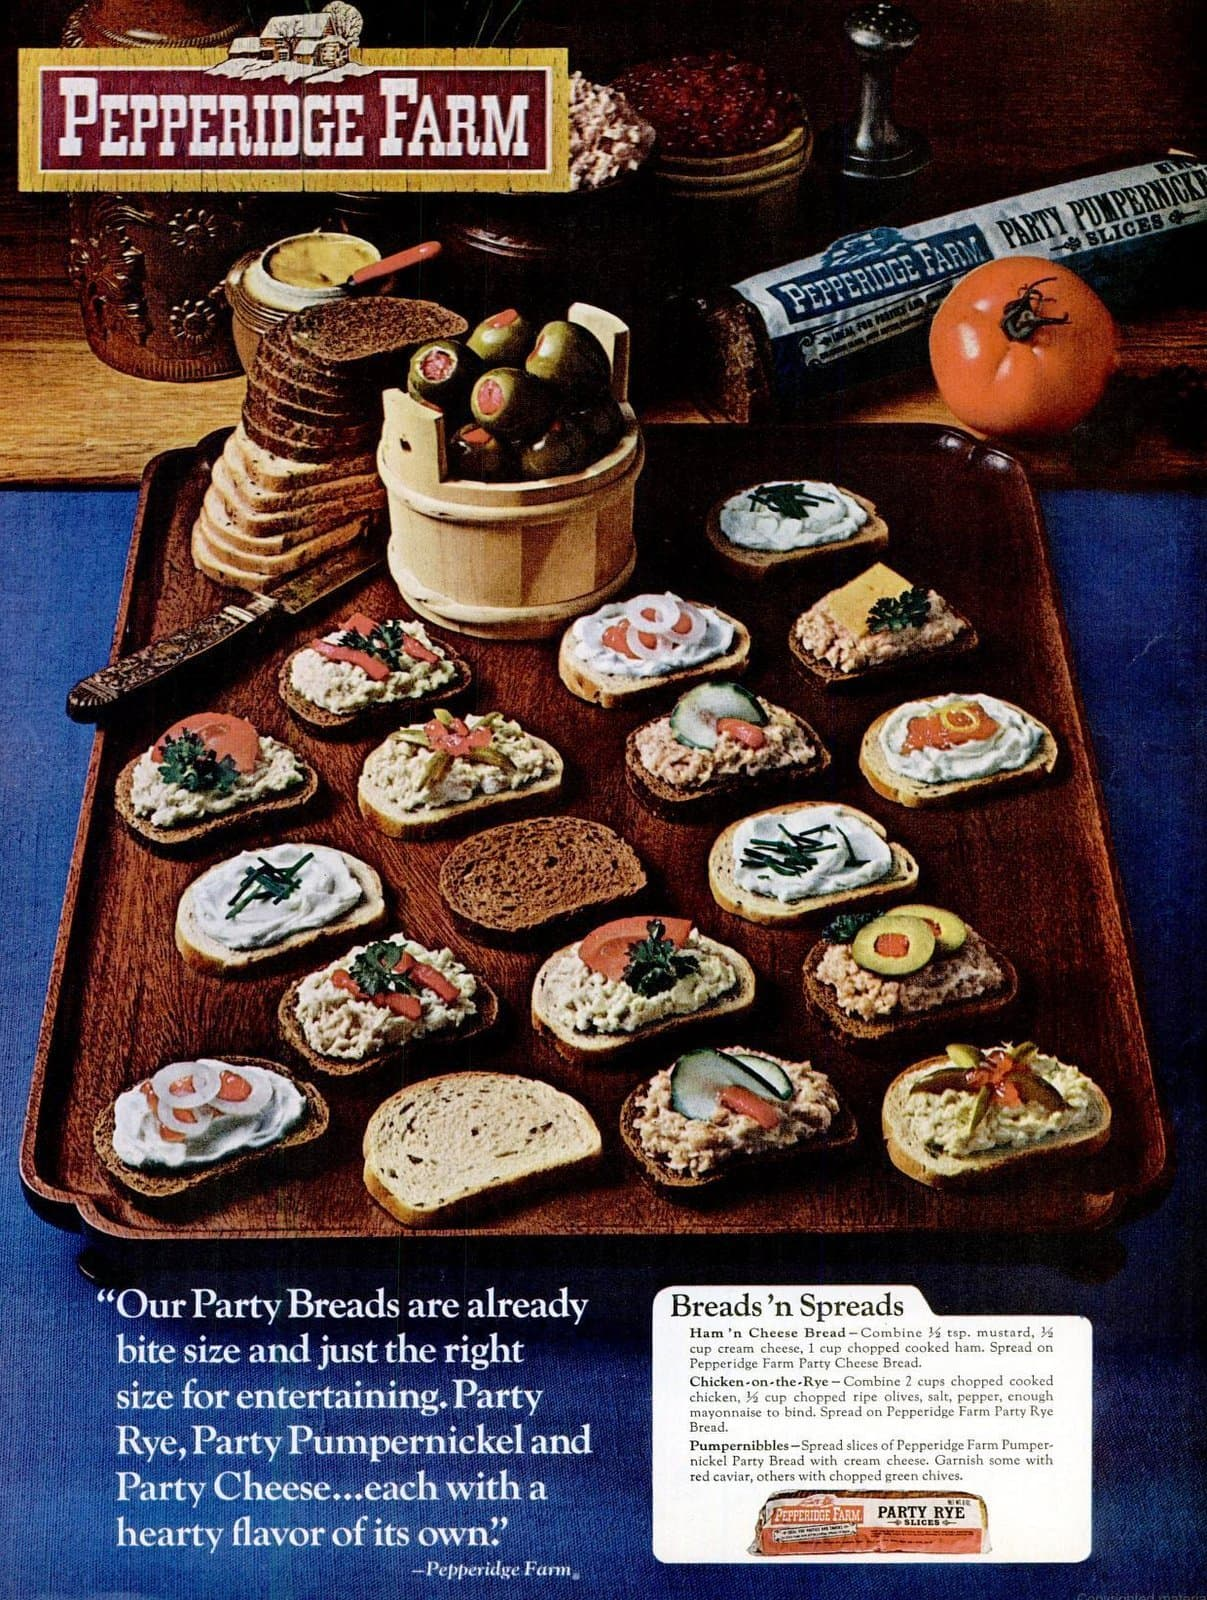 Pepperidge Farm Party Pumpernickel Slices - Bread loaf (1968)